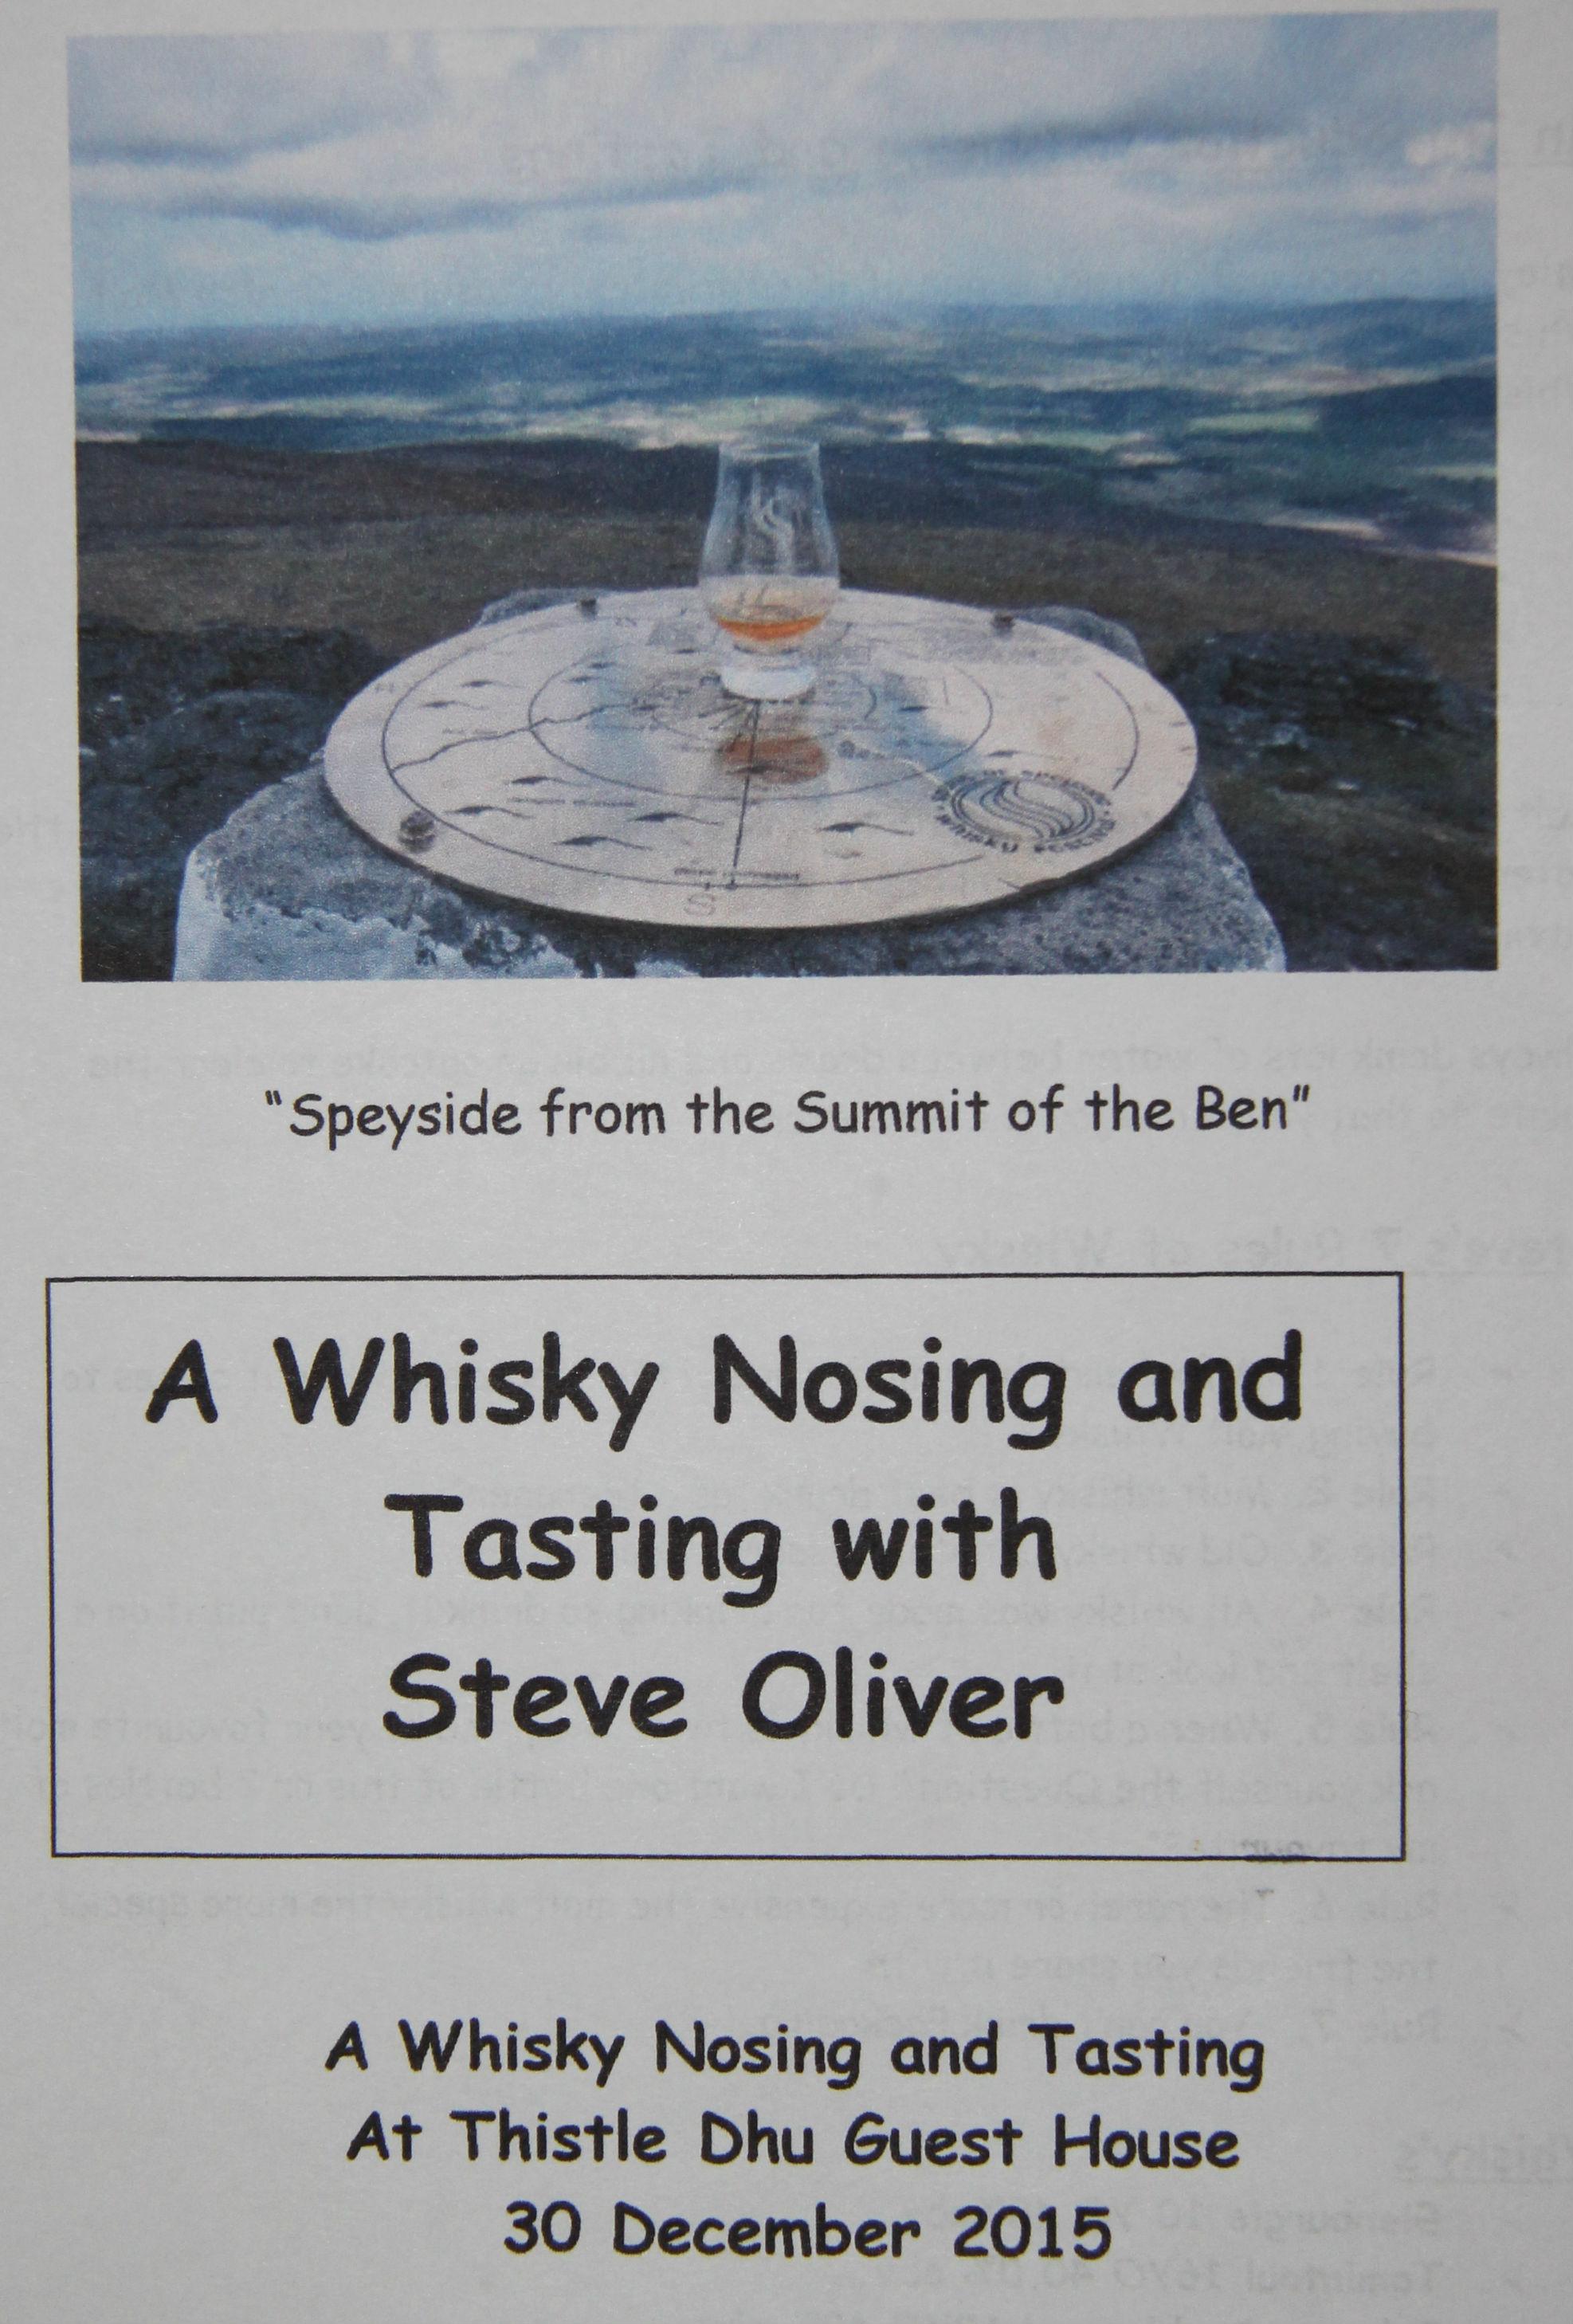 Whisky Tasting night 30 December 2015